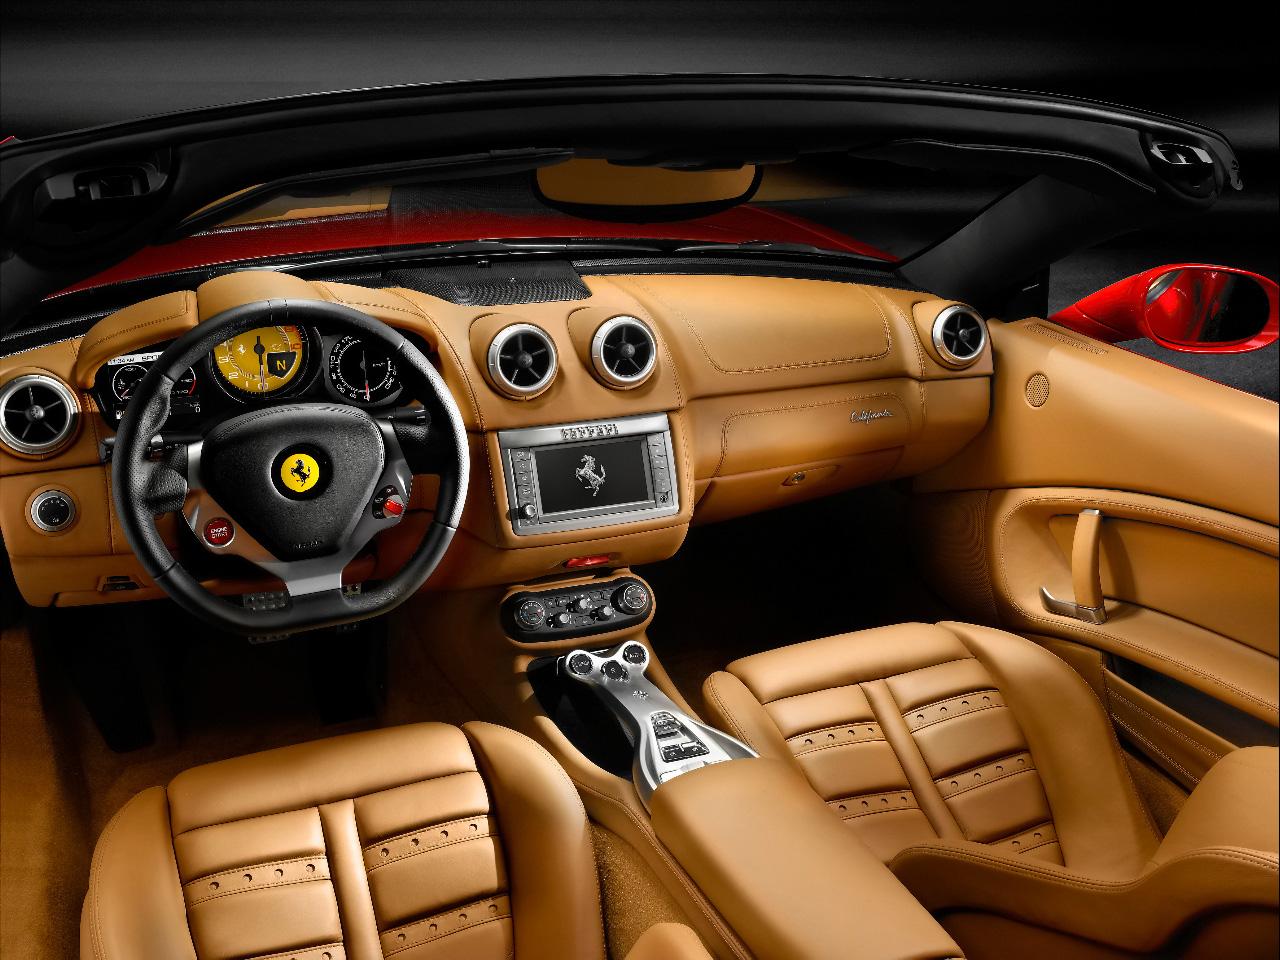 Ferrari California, Latest Car,2011,2012,2013 Images, Pictures, Wallpapers